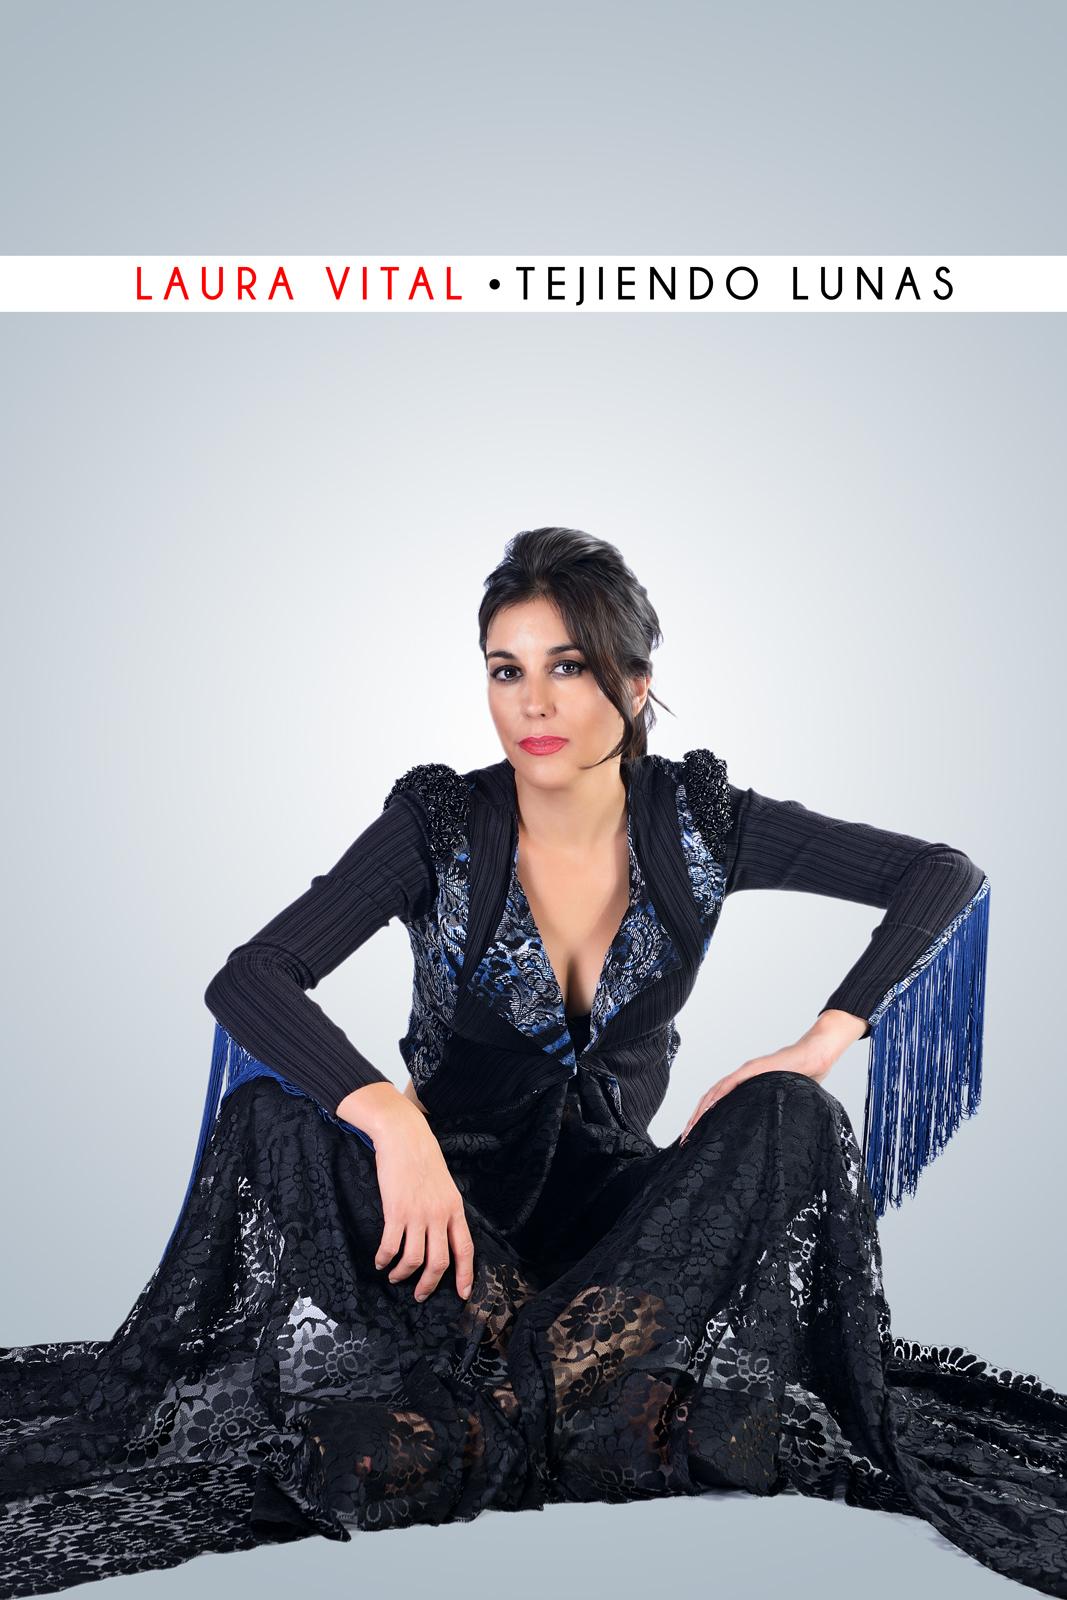 Tejiendo Lunas Laura Vital